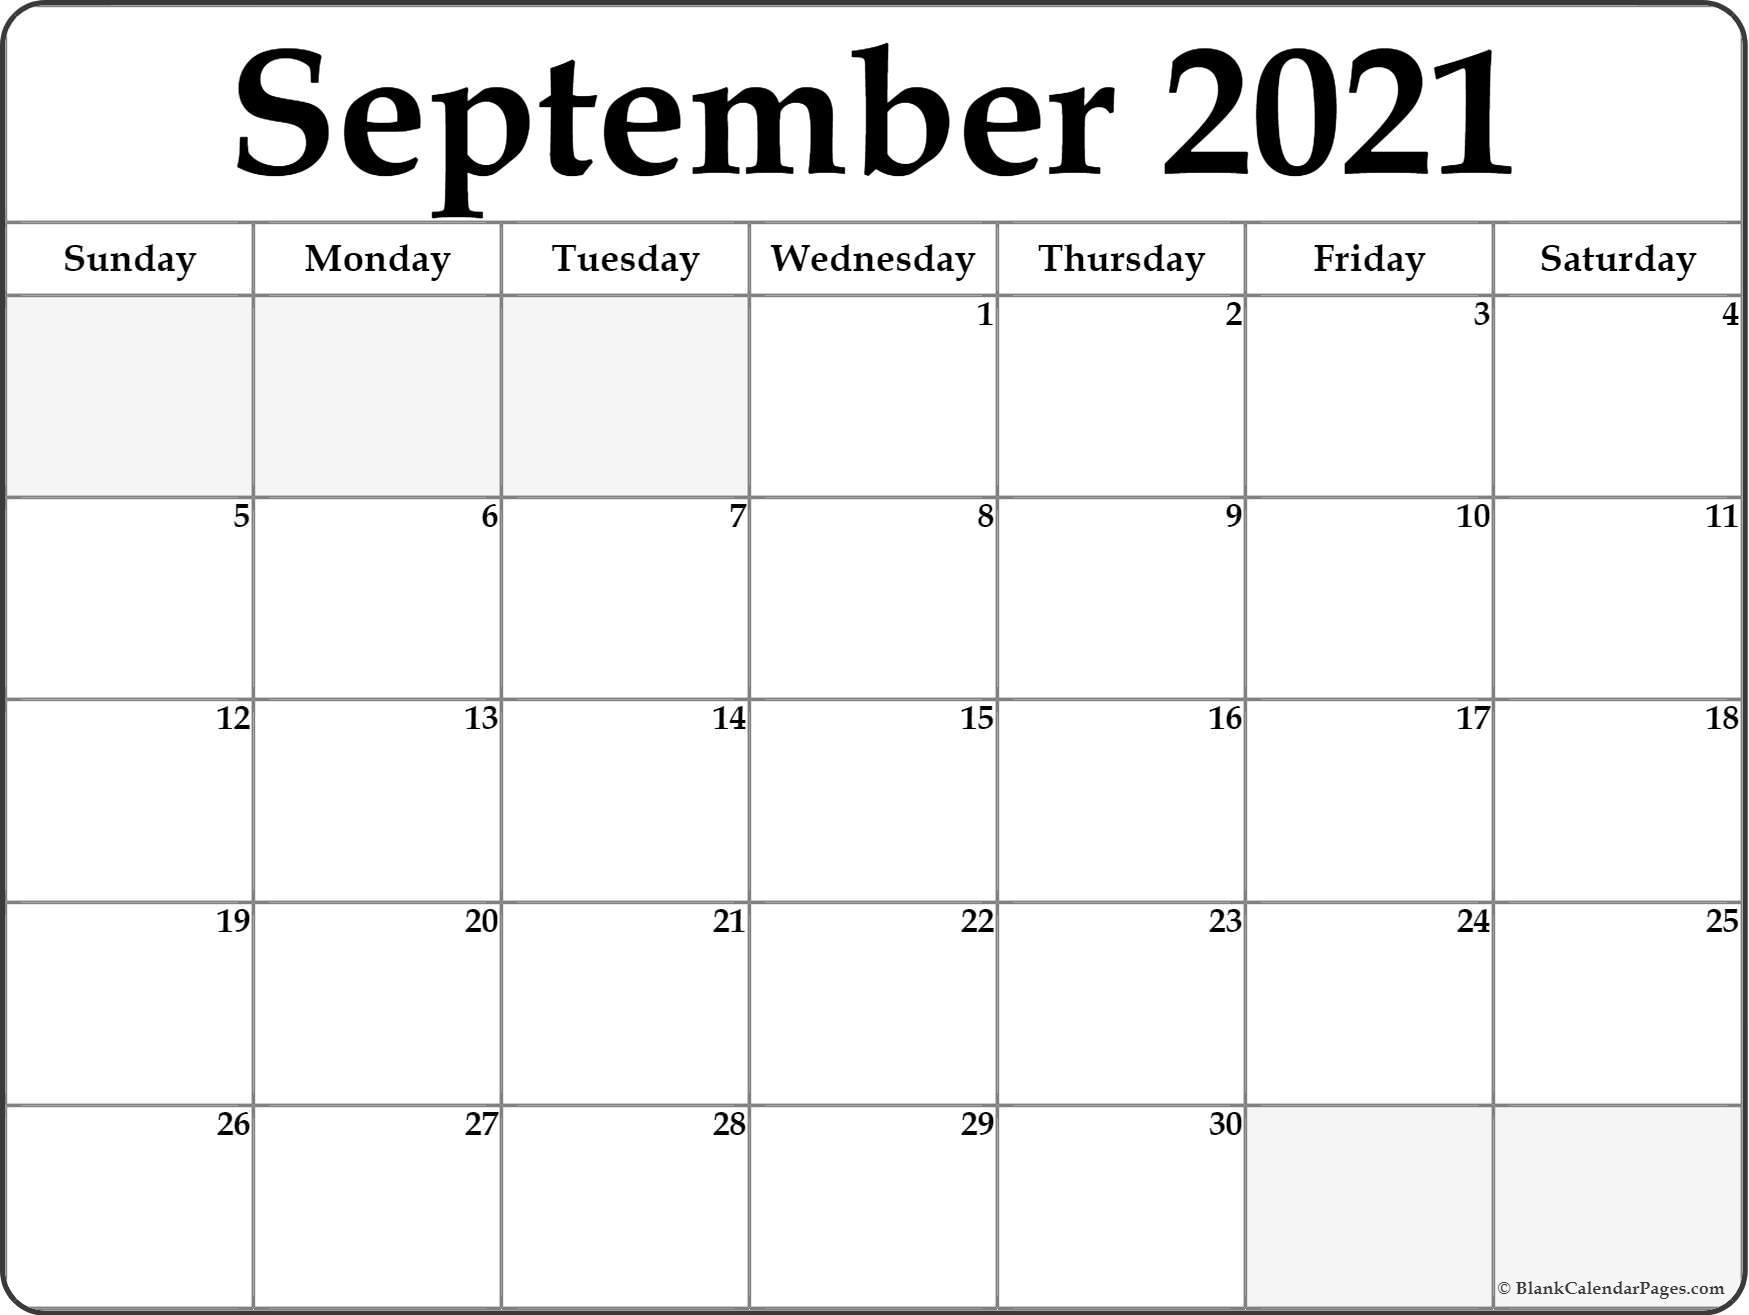 Blank September 2021 Calendar Free Printable   Printable Calendar September 2021 Lunar Calendar